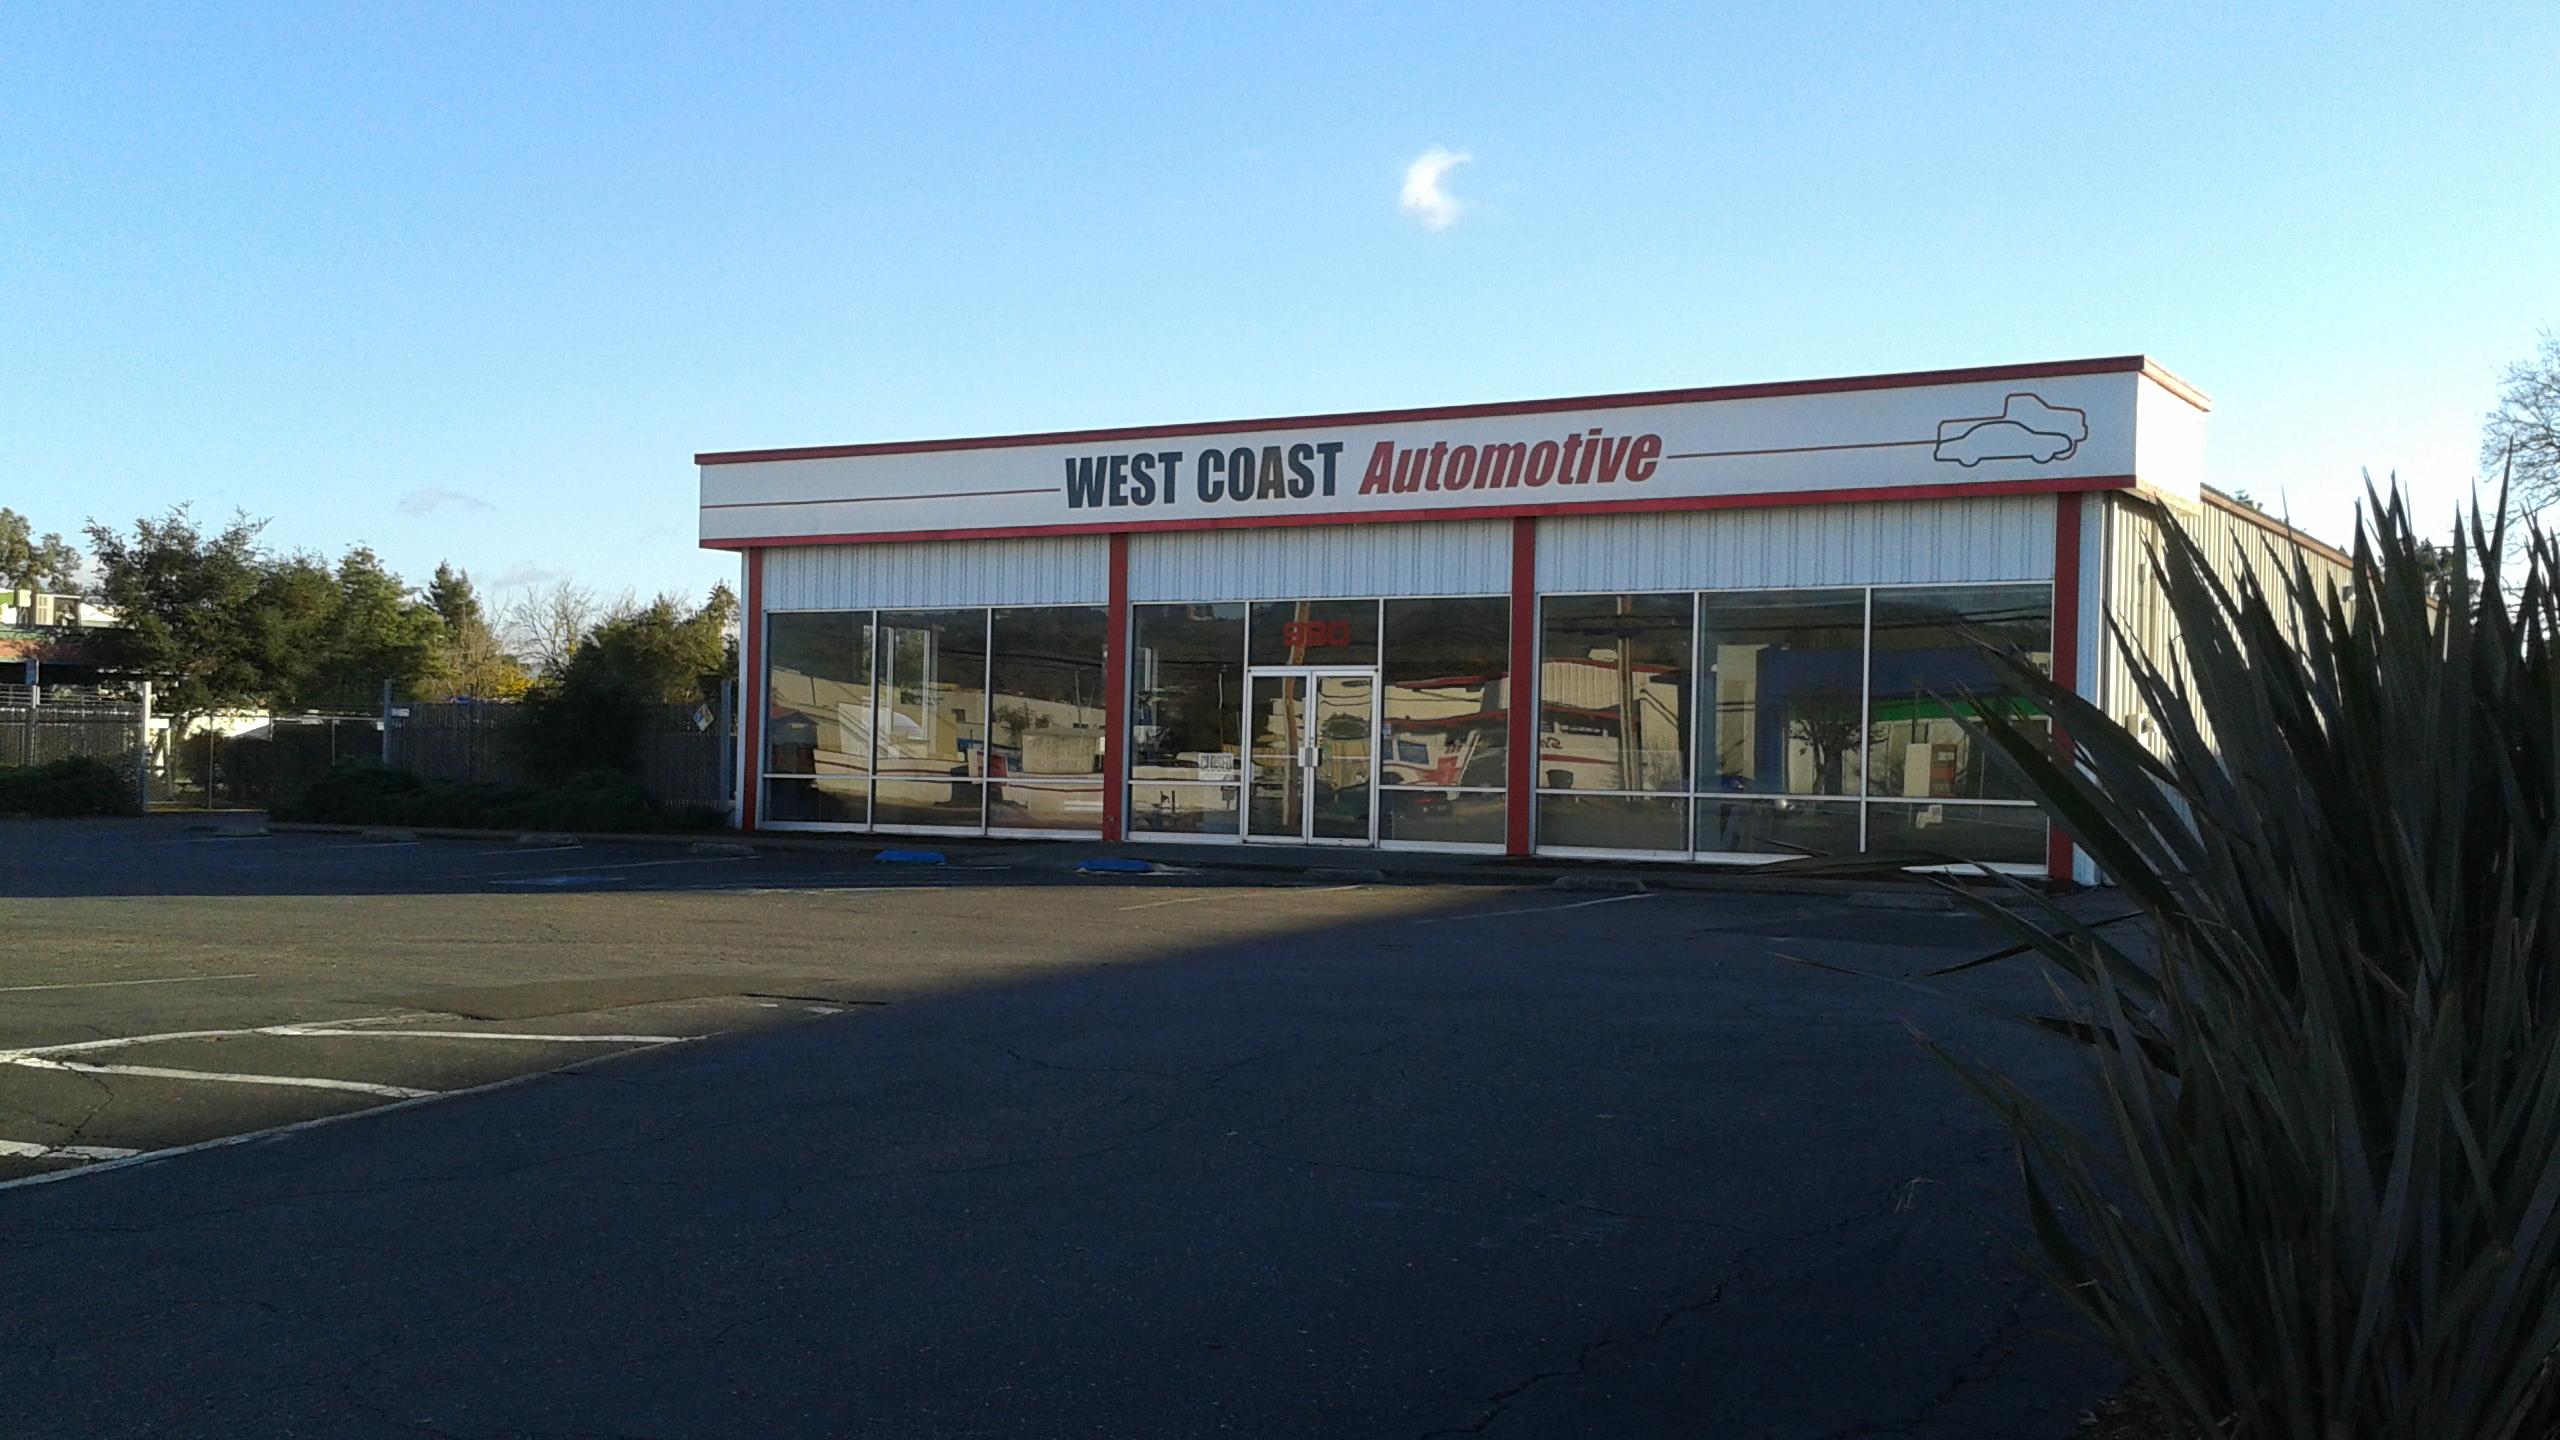 West Coast Automotive